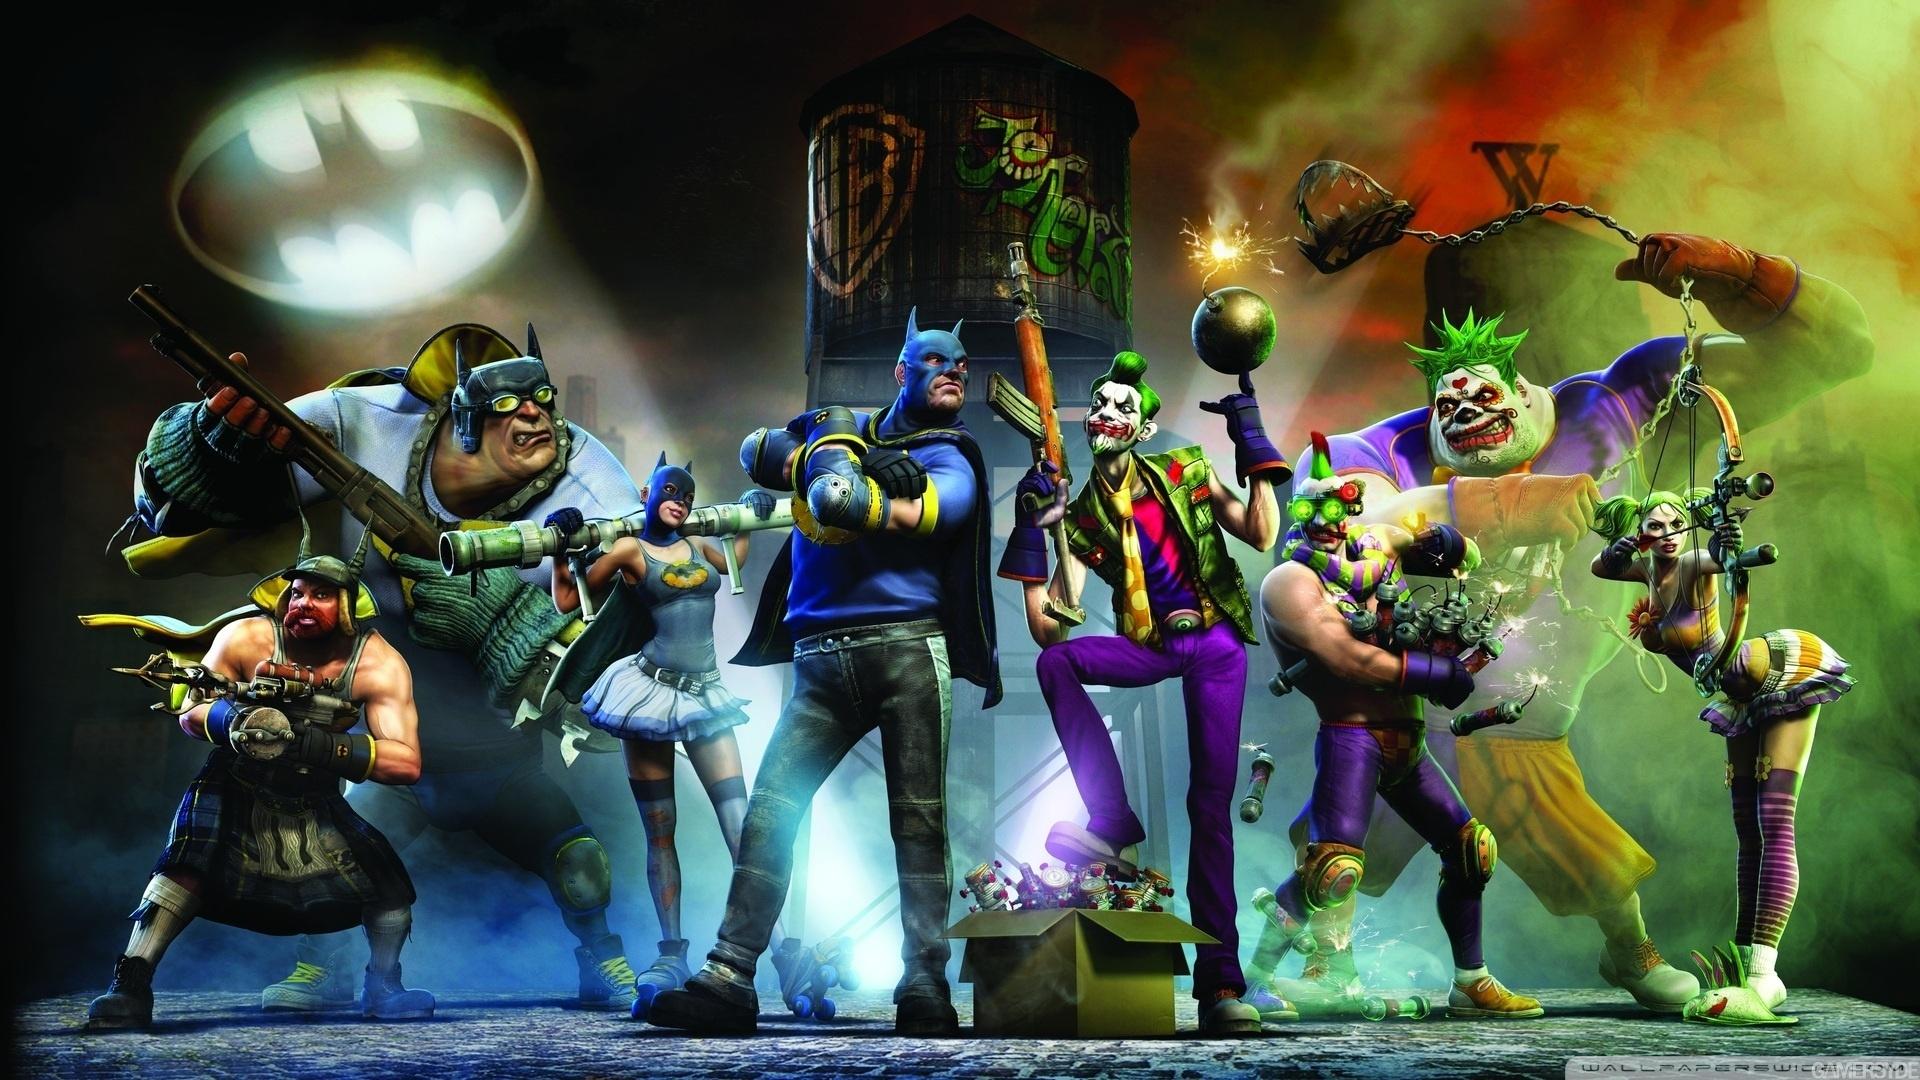 Joker Vs Batman HD desktop wallpaper : High Definition : Mobile